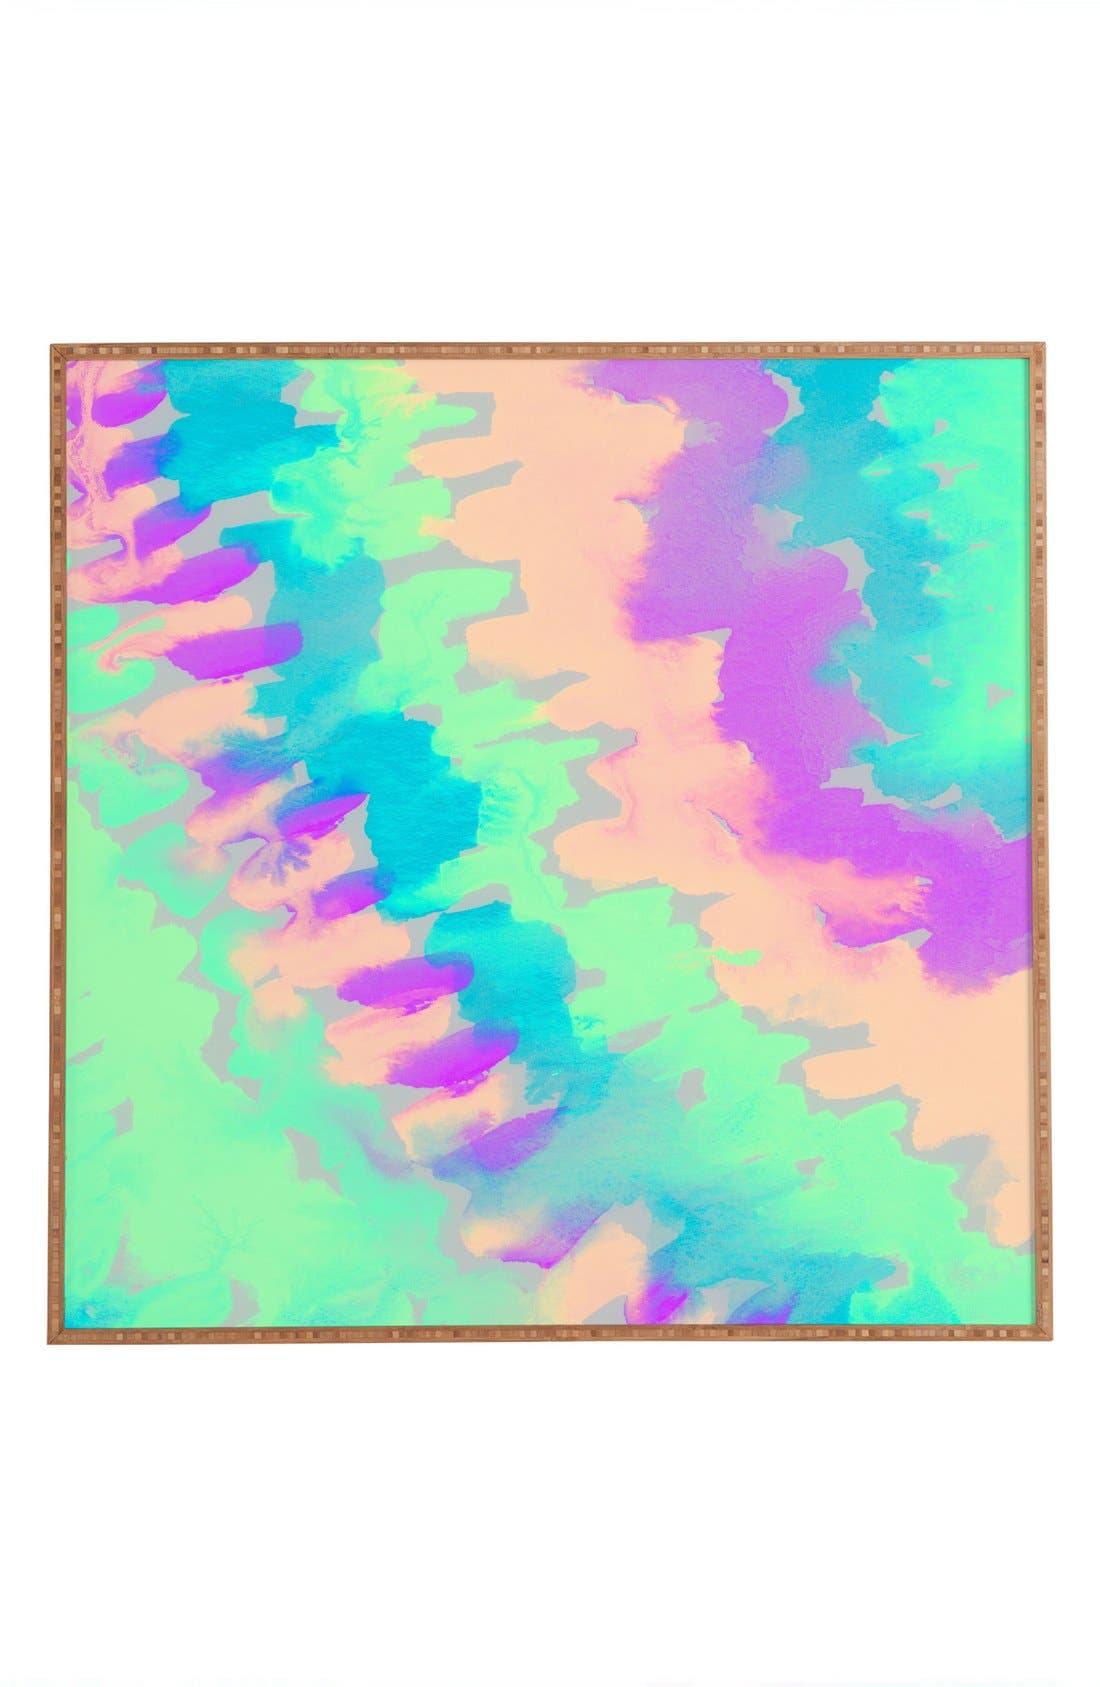 Main Image - Deny Designs 'Some Kind of Wonderful' Framed Wall Art